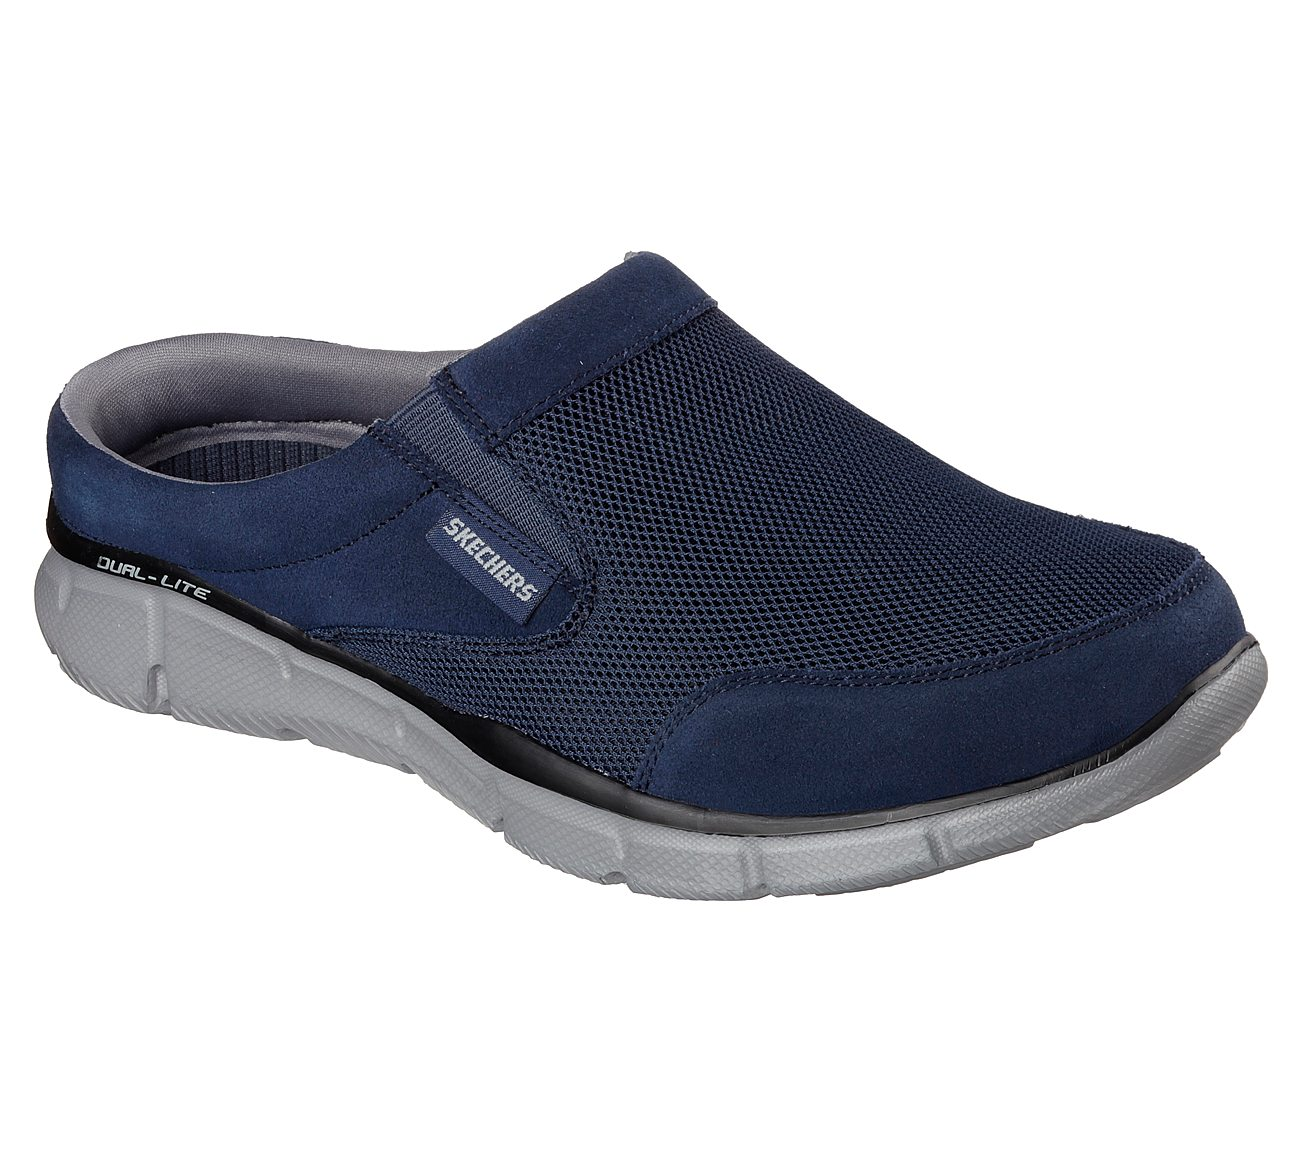 Buy SKECHERS Equalizer Coast to Coast Sport Shoes w2tRN